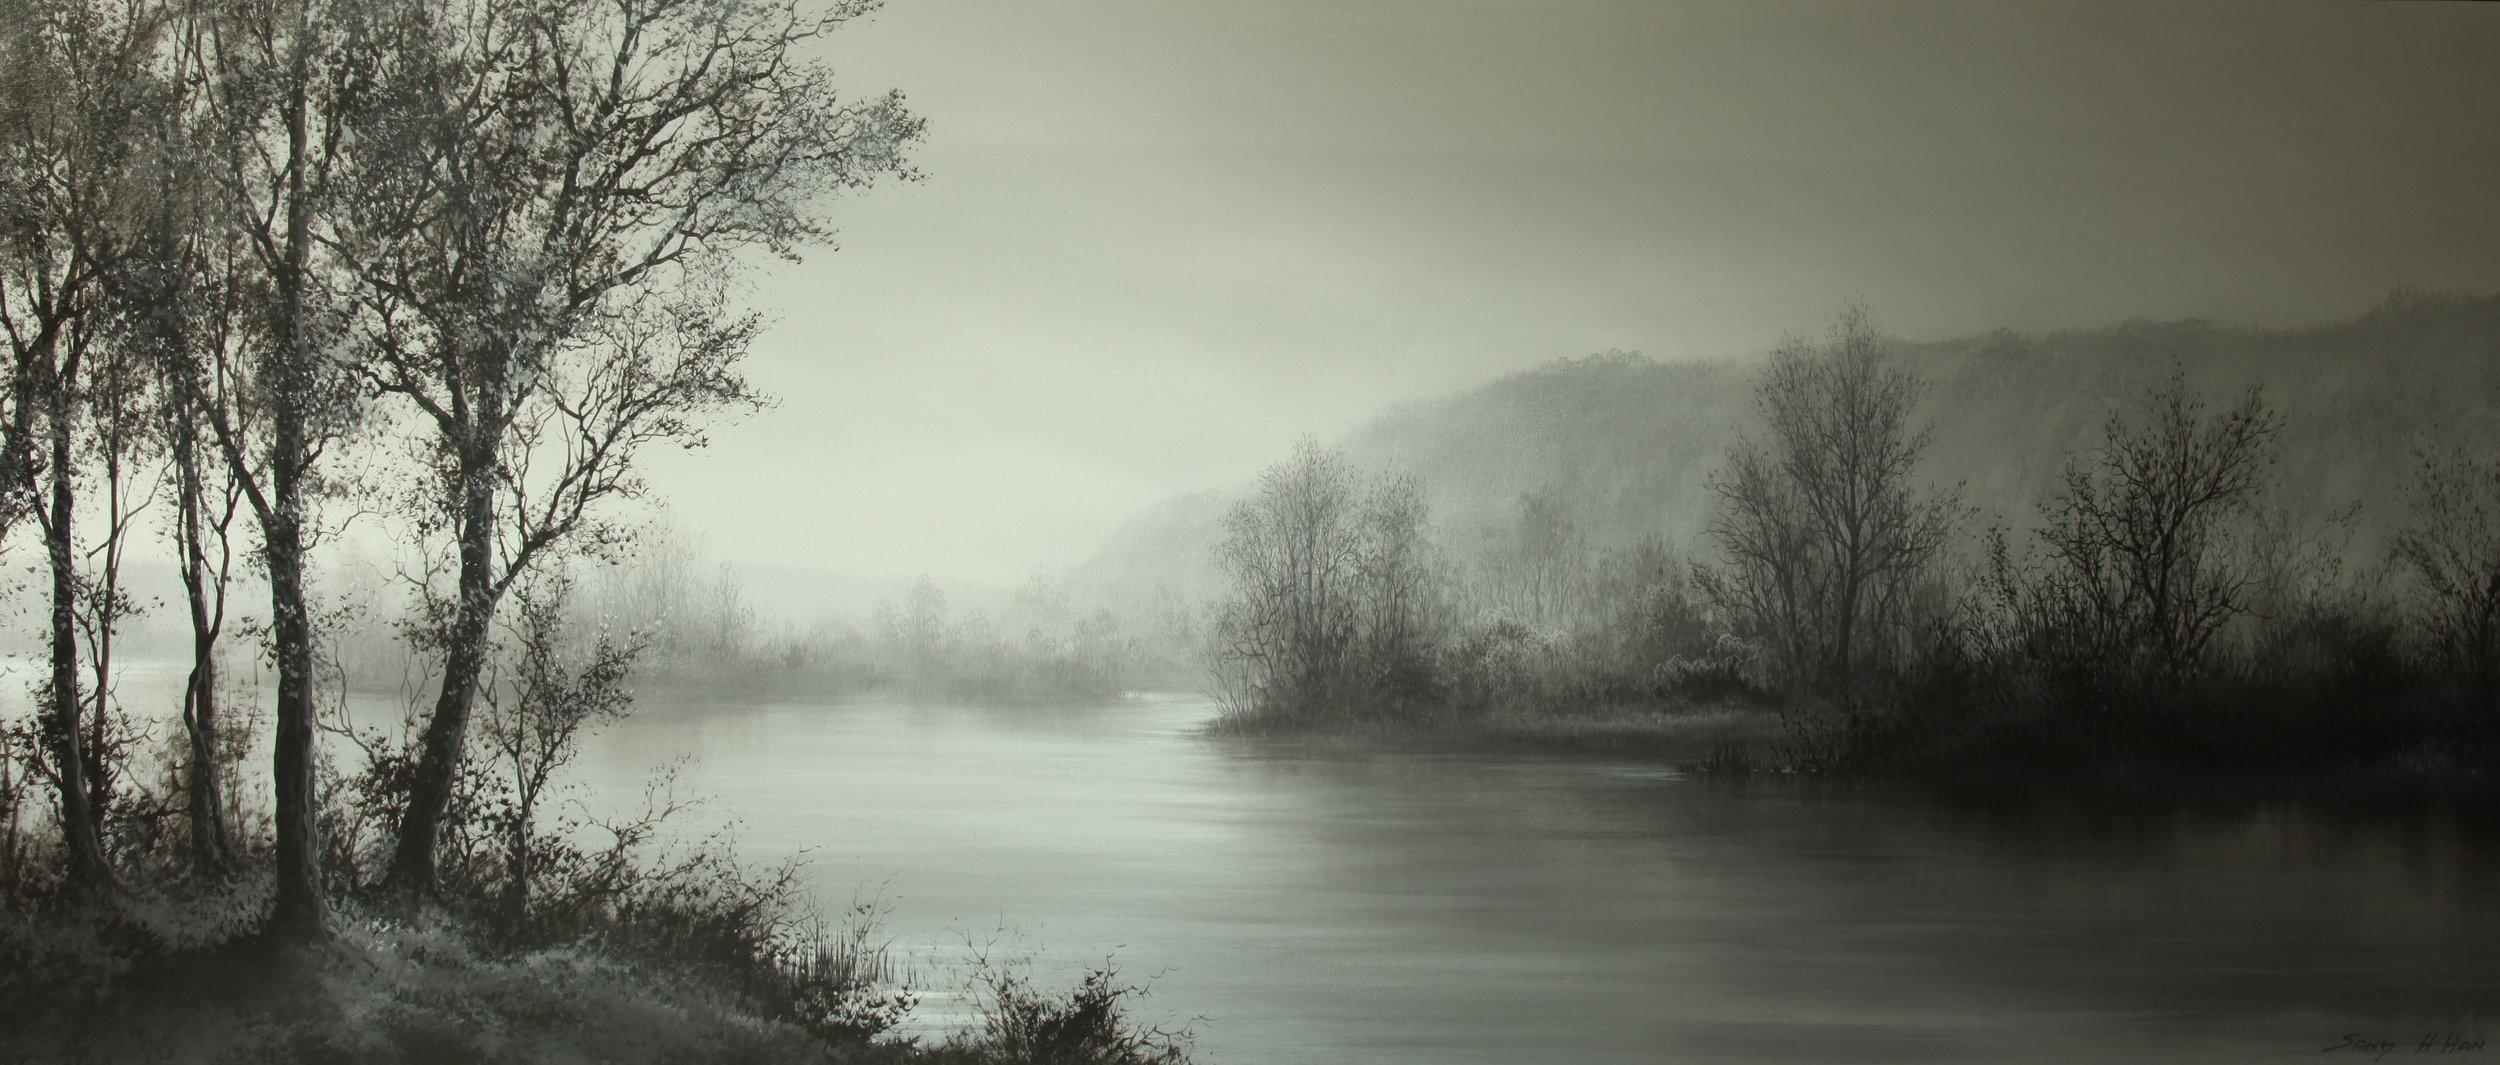 River Wide Enough.JPG